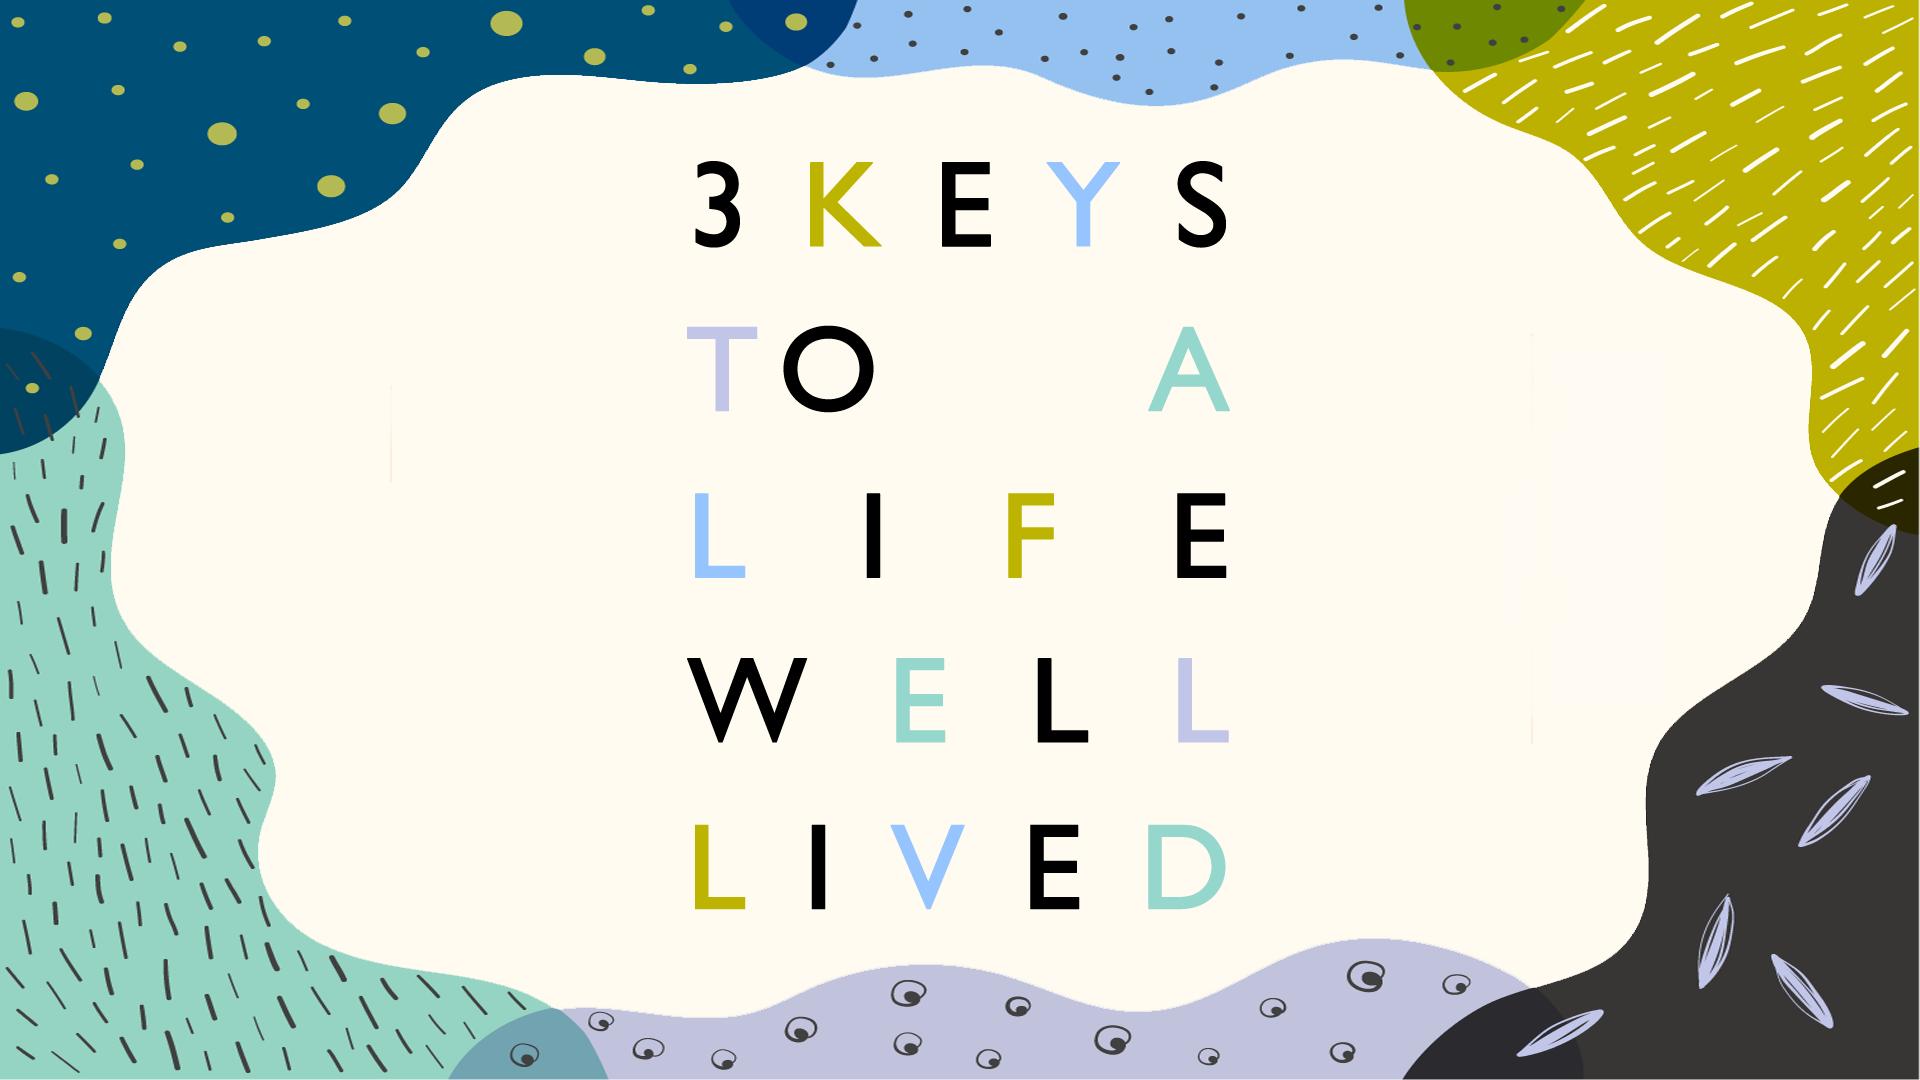 3 keys HD graphic 2.png